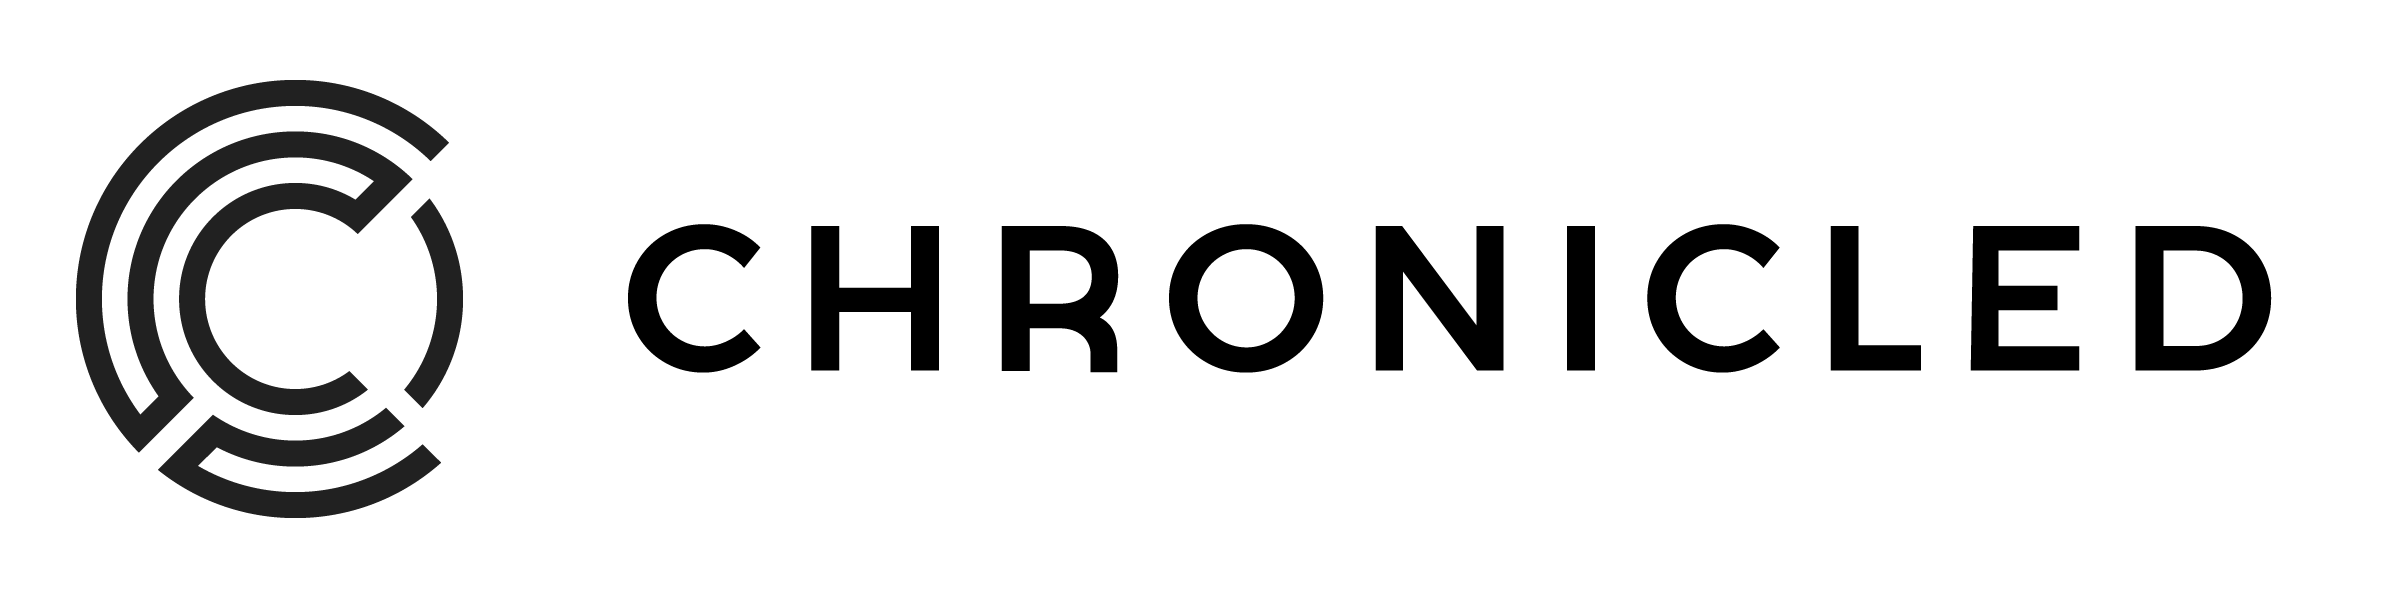 Chronicled LogoArtboard 1@2x.png